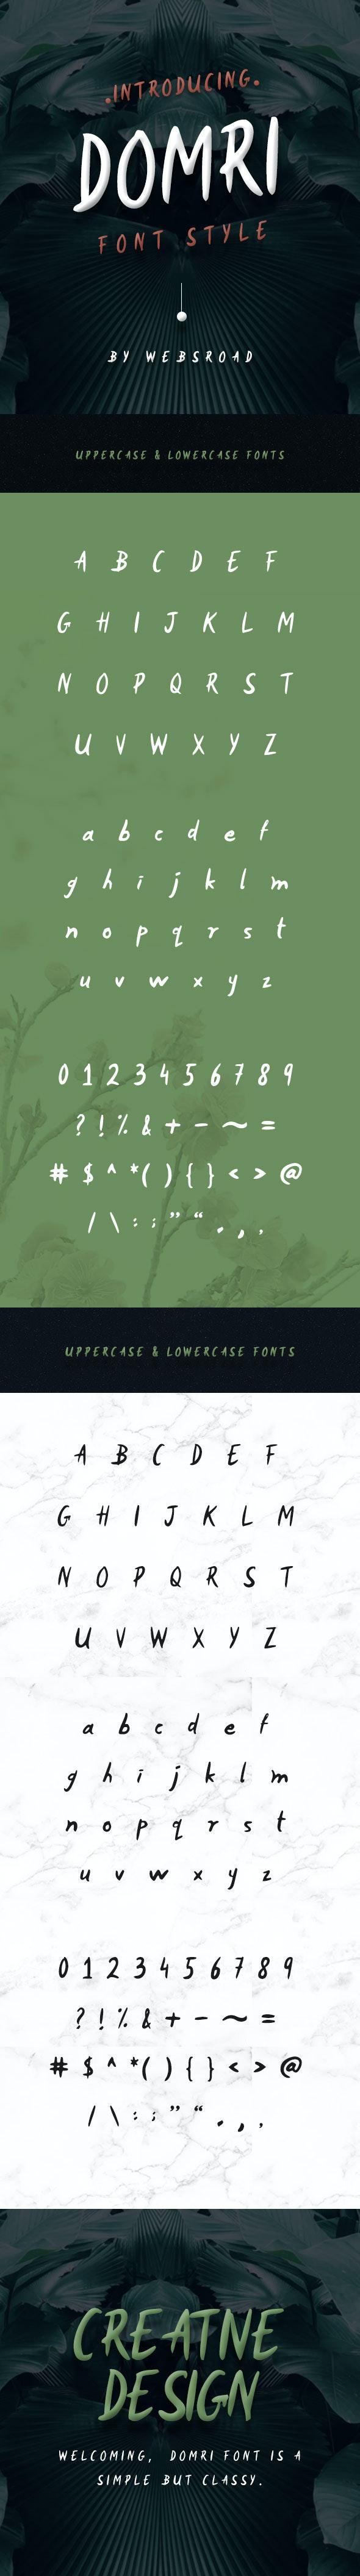 Domri Handwritten Font Style - Handwriting Fonts